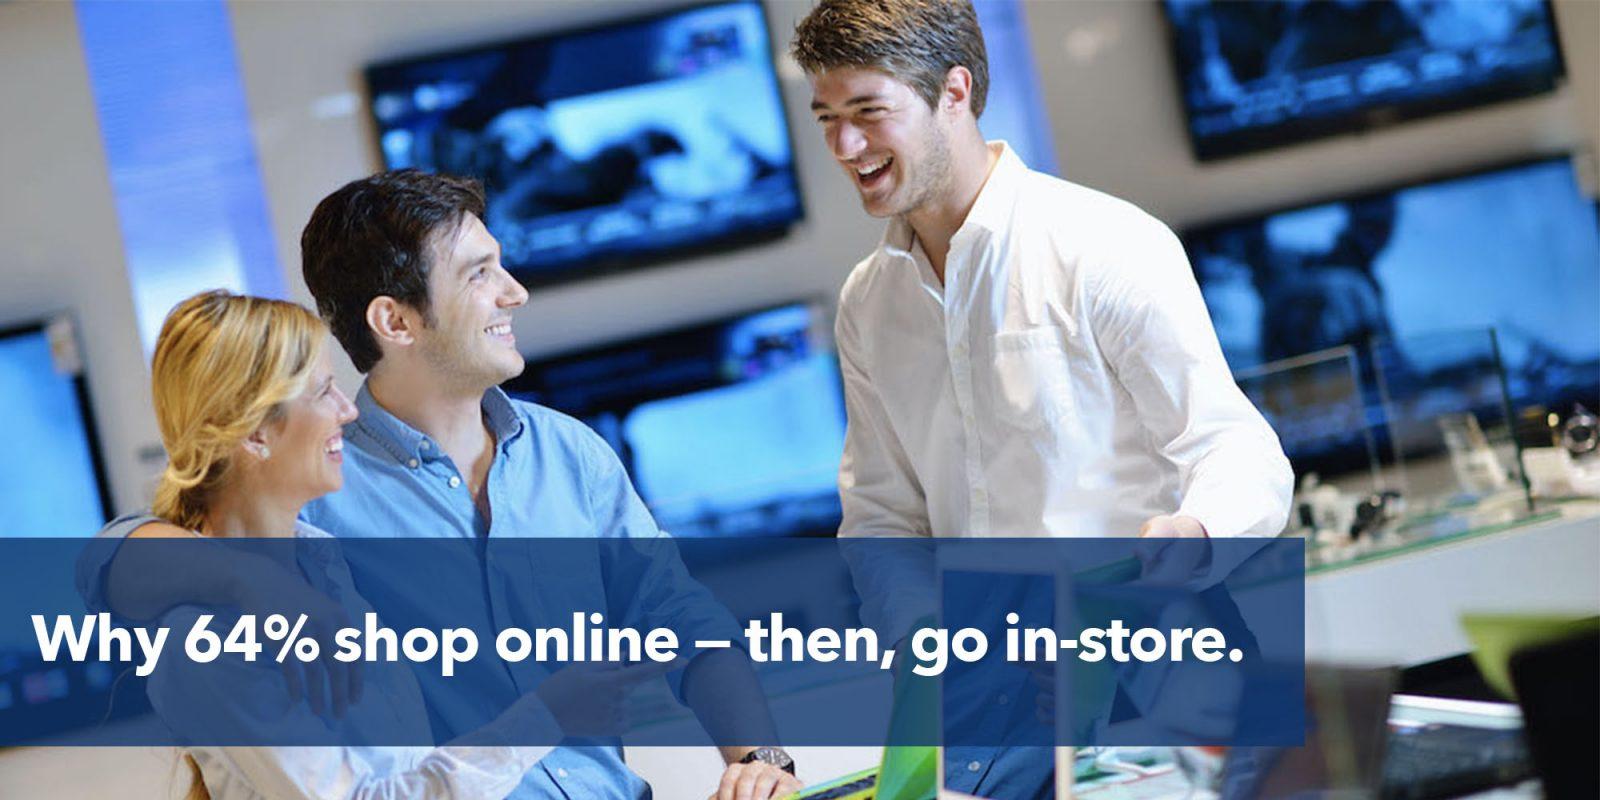 Why 64% shop online — then, go visit a store.